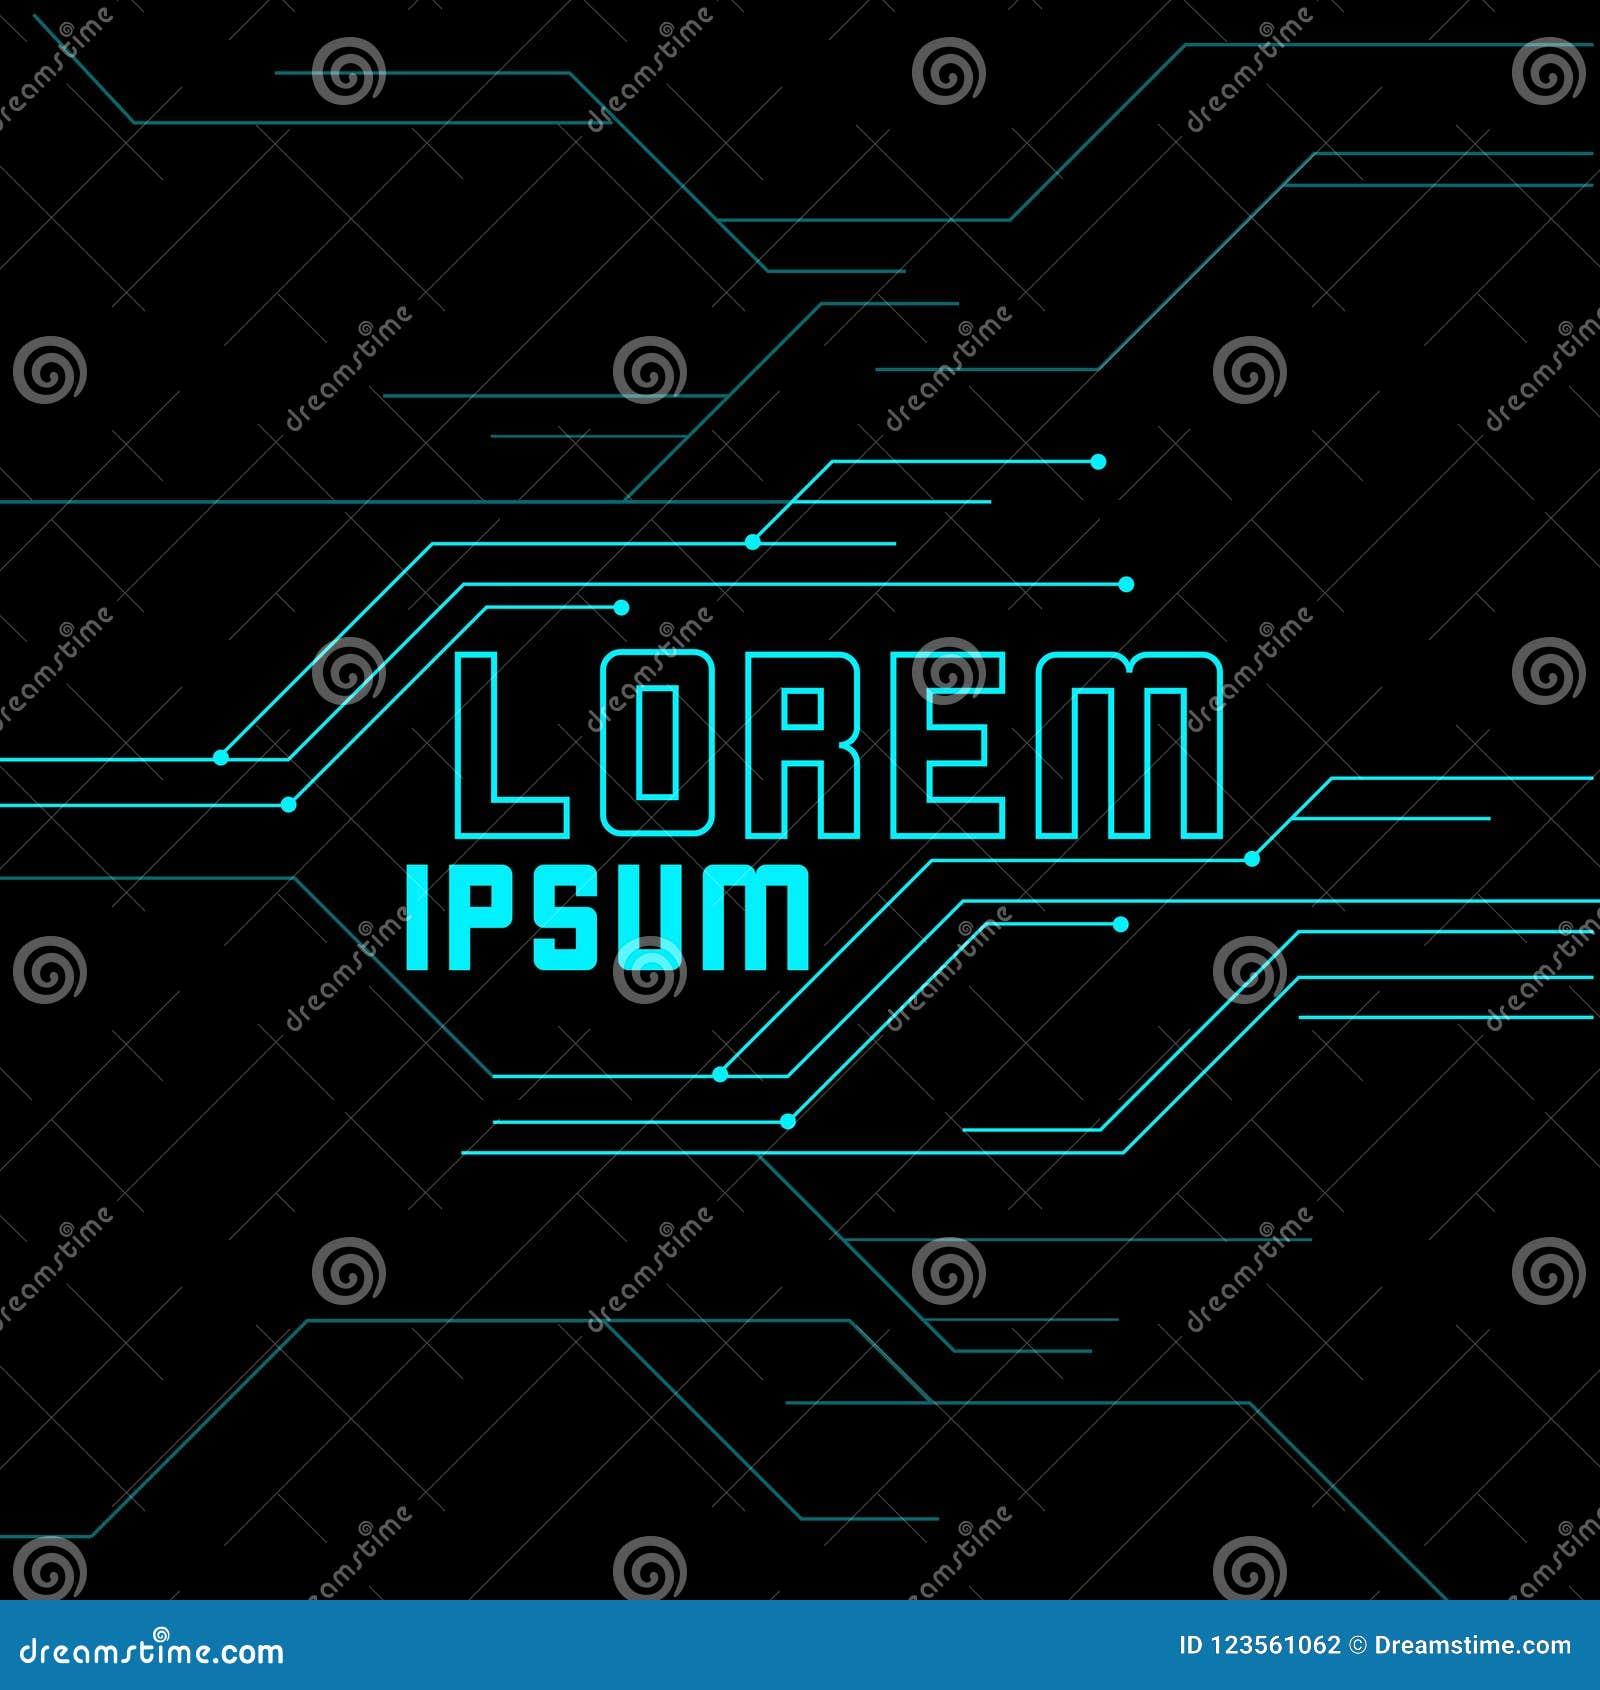 Simple Elegant Modern Background Stock Vector Illustration Of